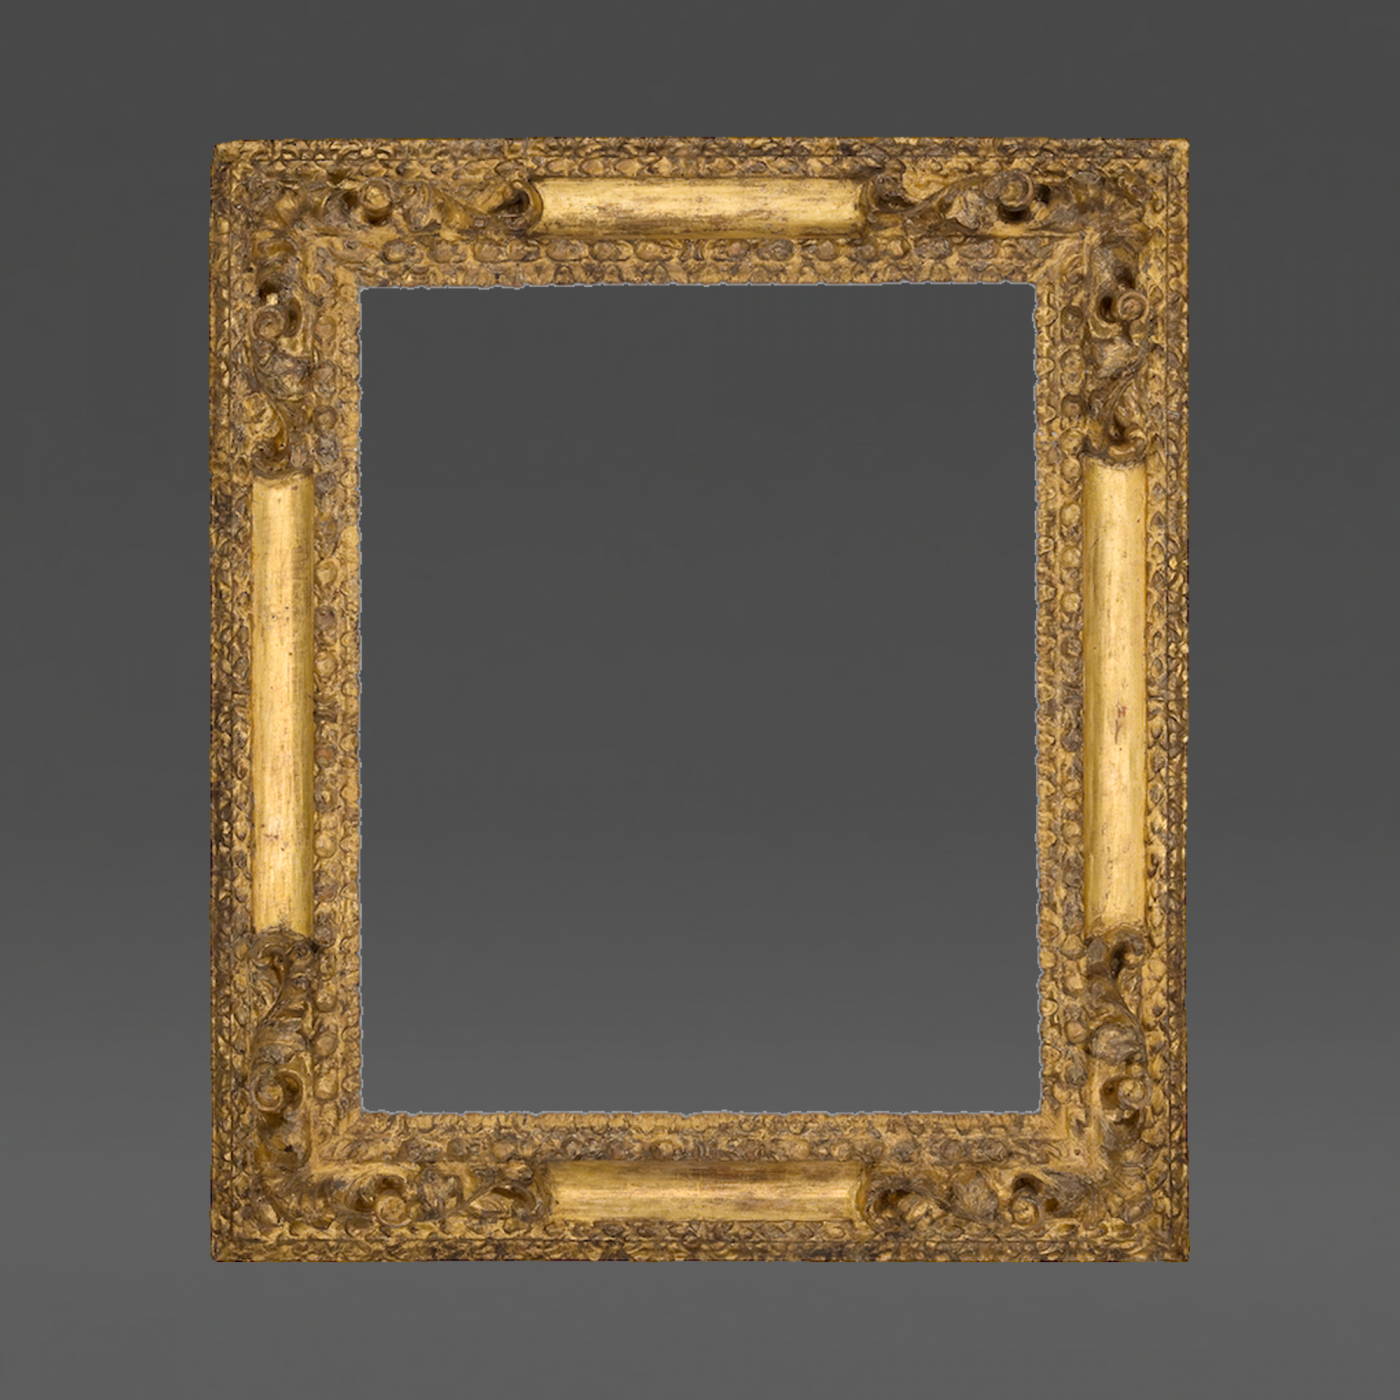 17th Century Spanish Receding Frame with Corners